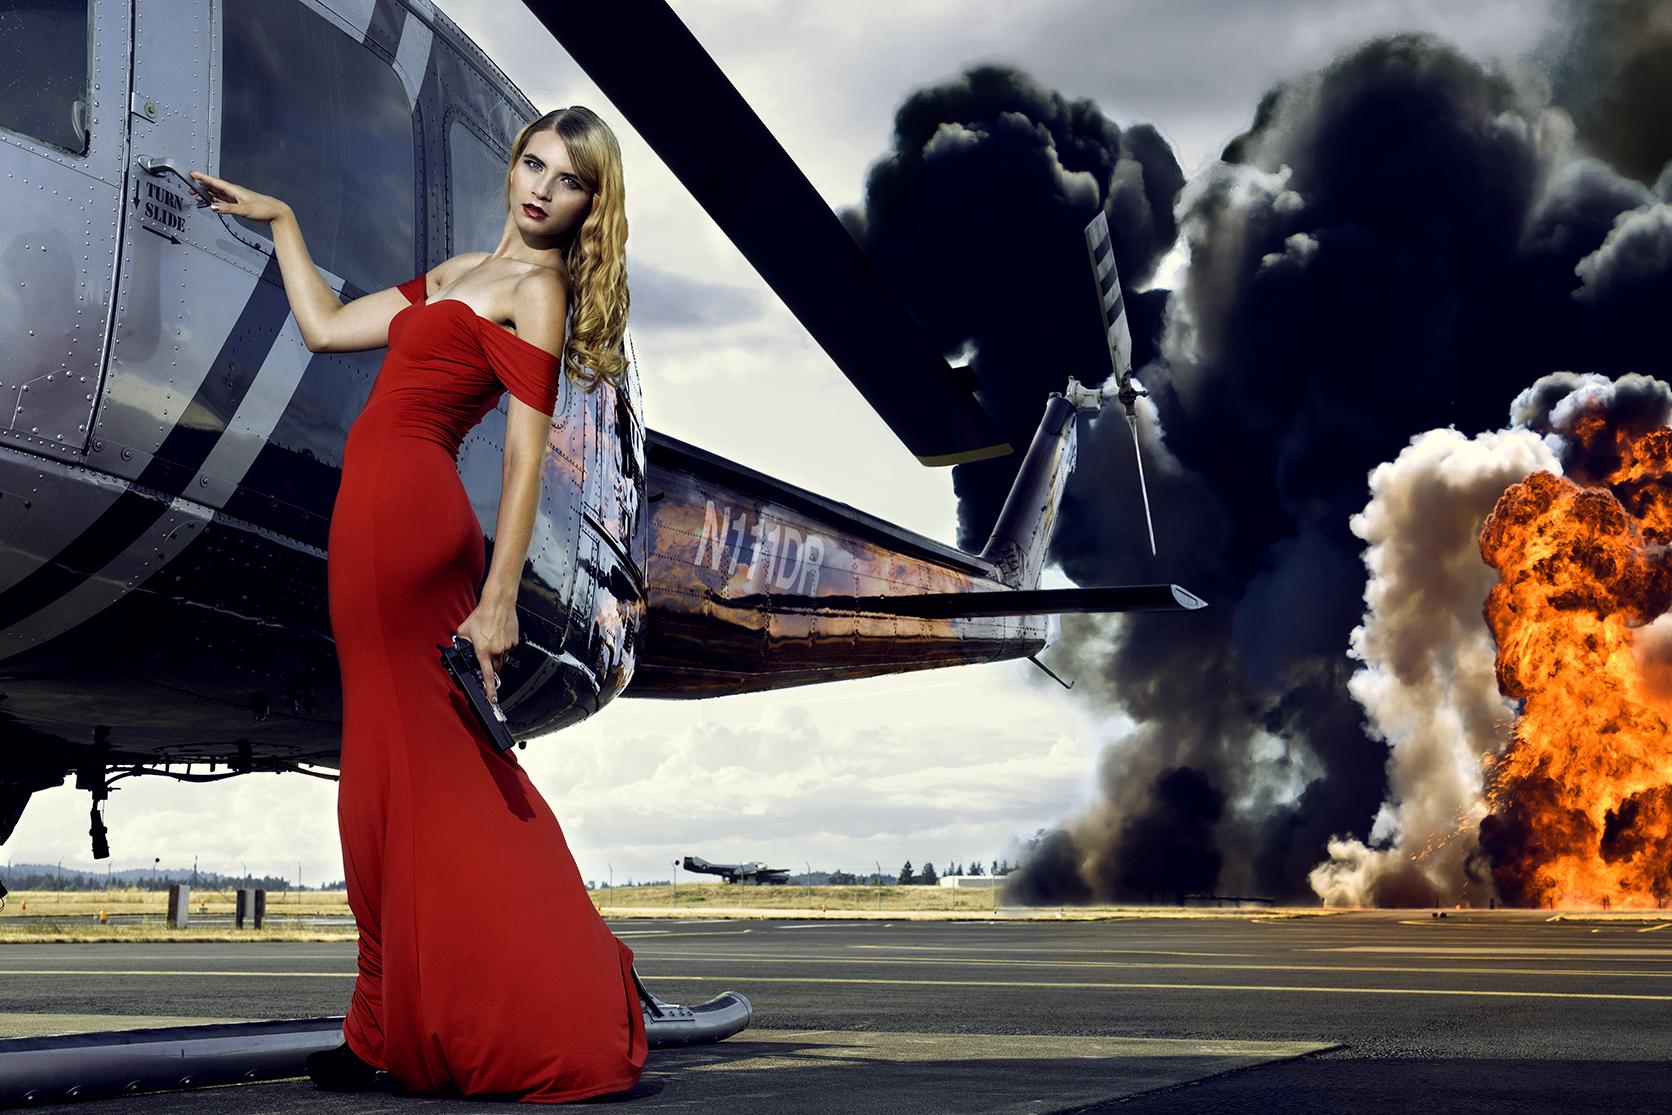 Nicole York Photography_Femme Fatale_2_07-14-15-015.jpg